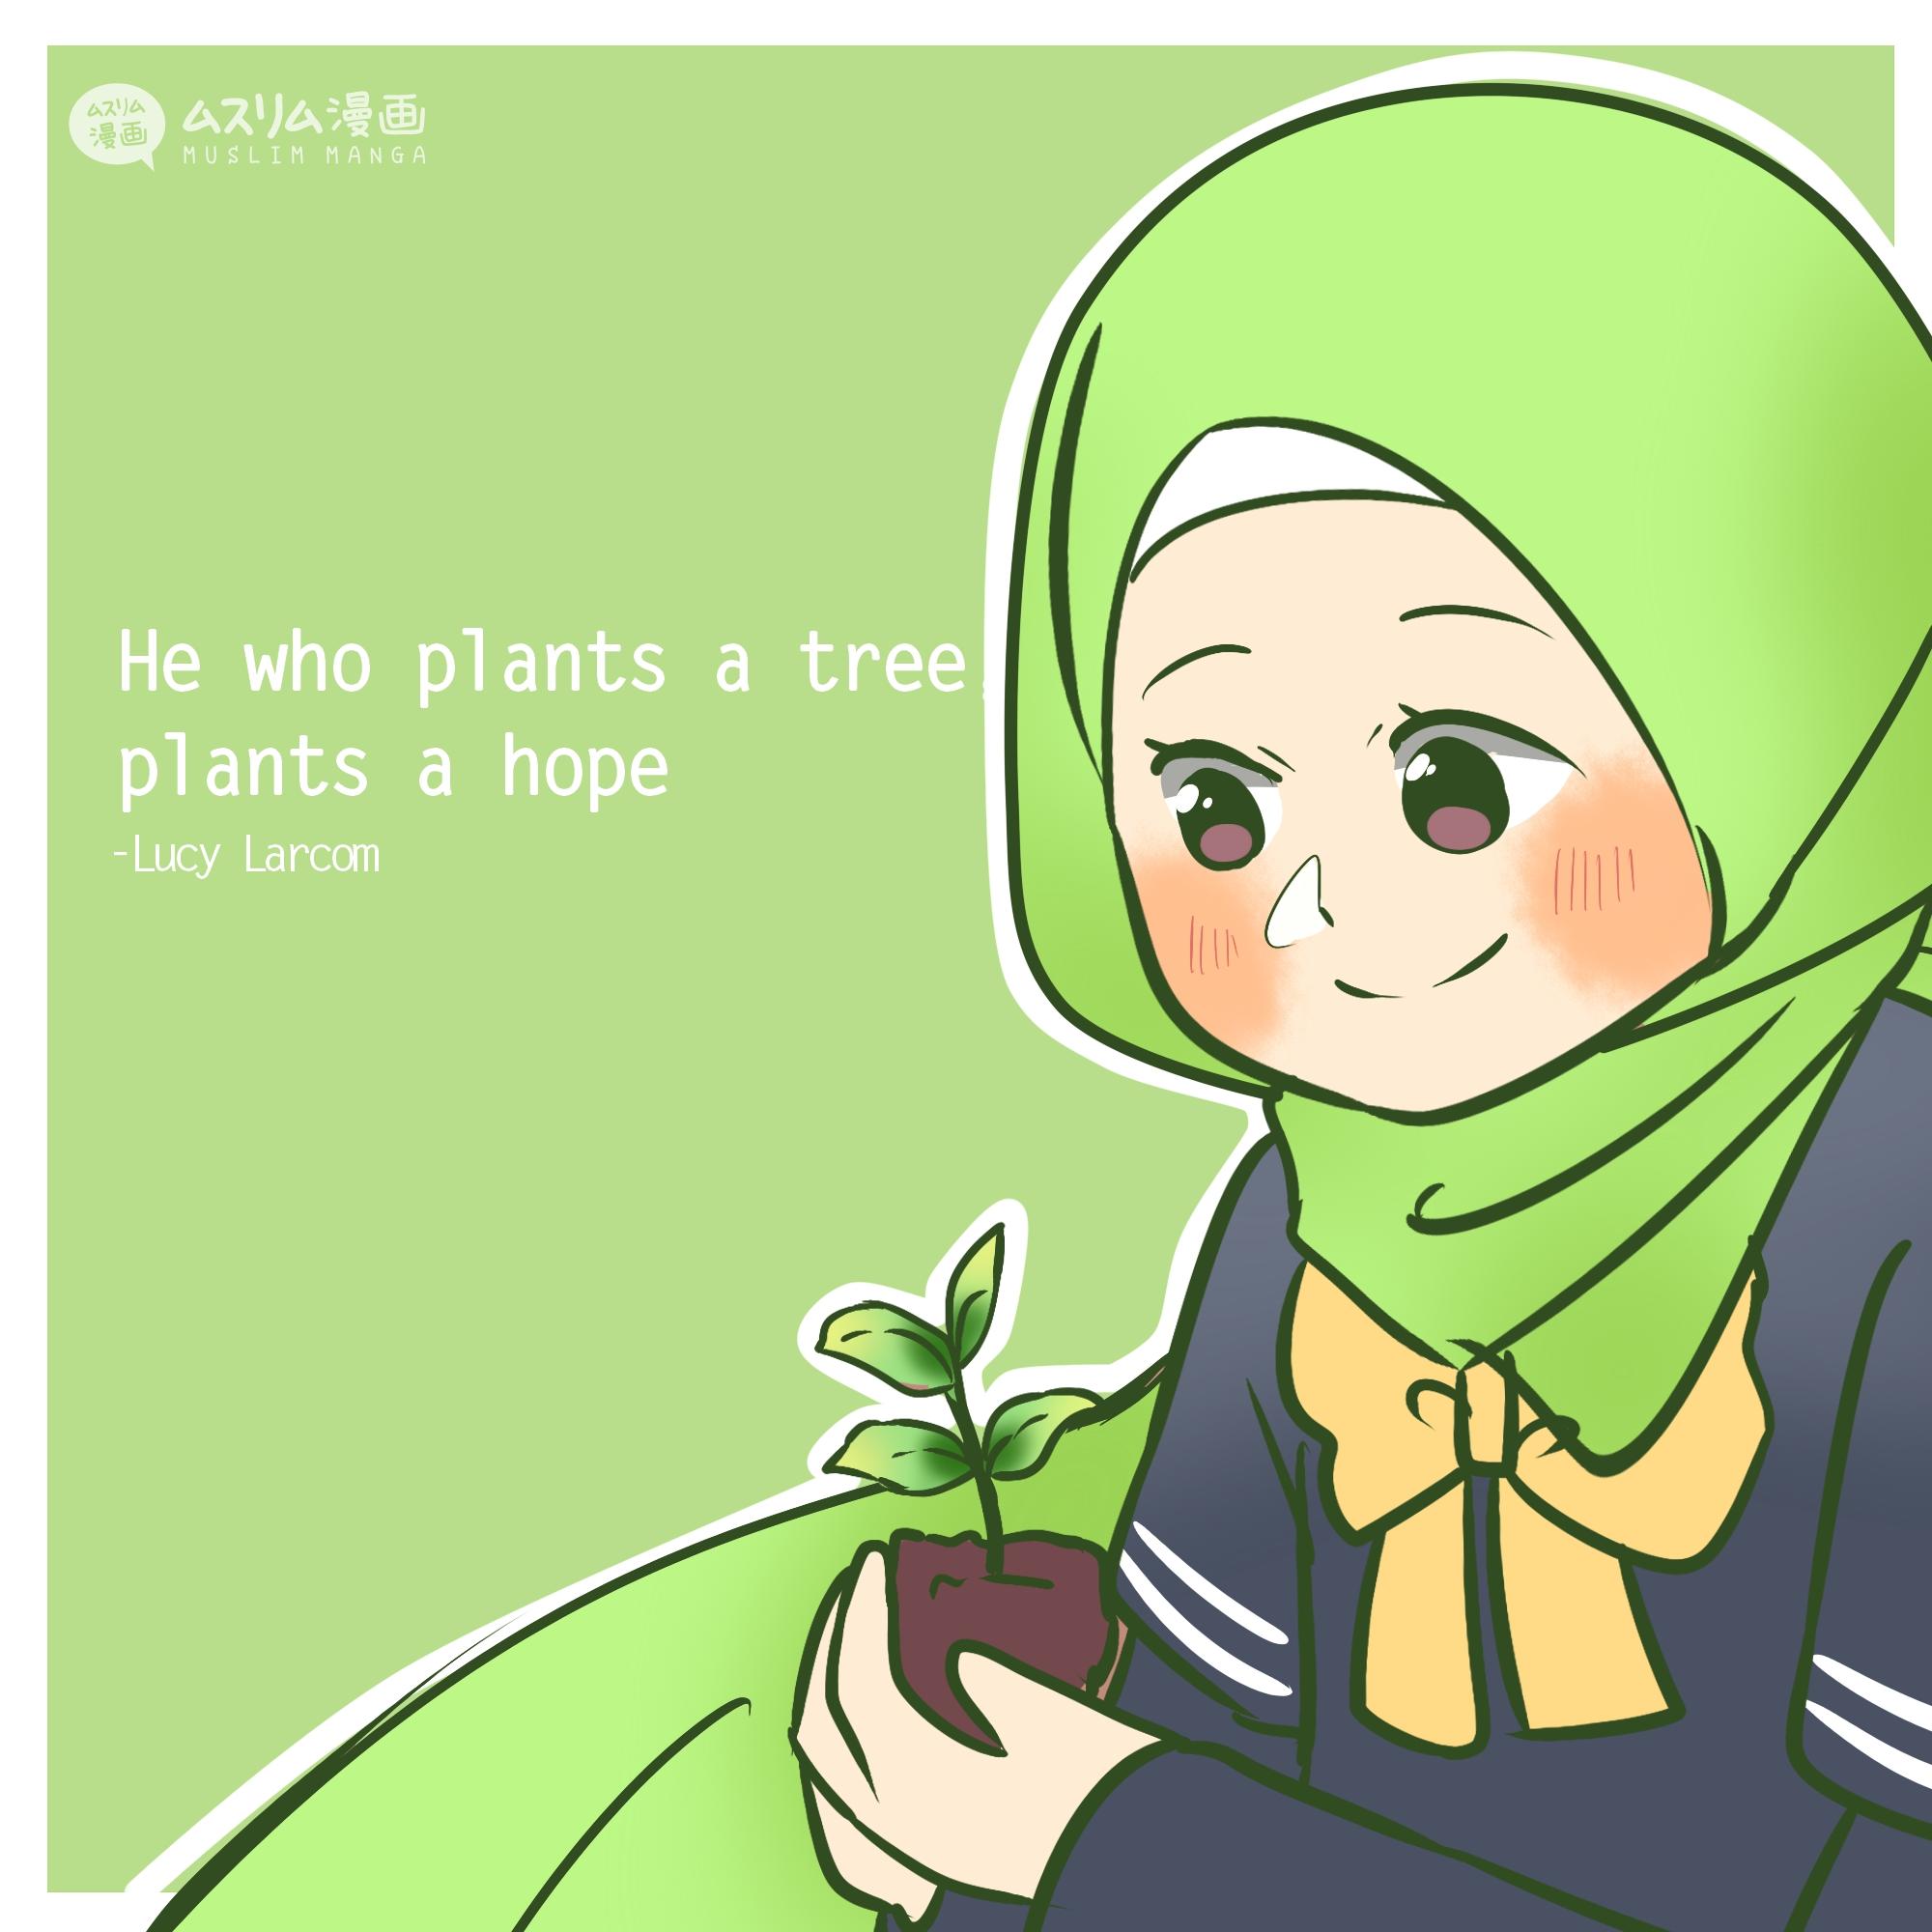 aya plant tree